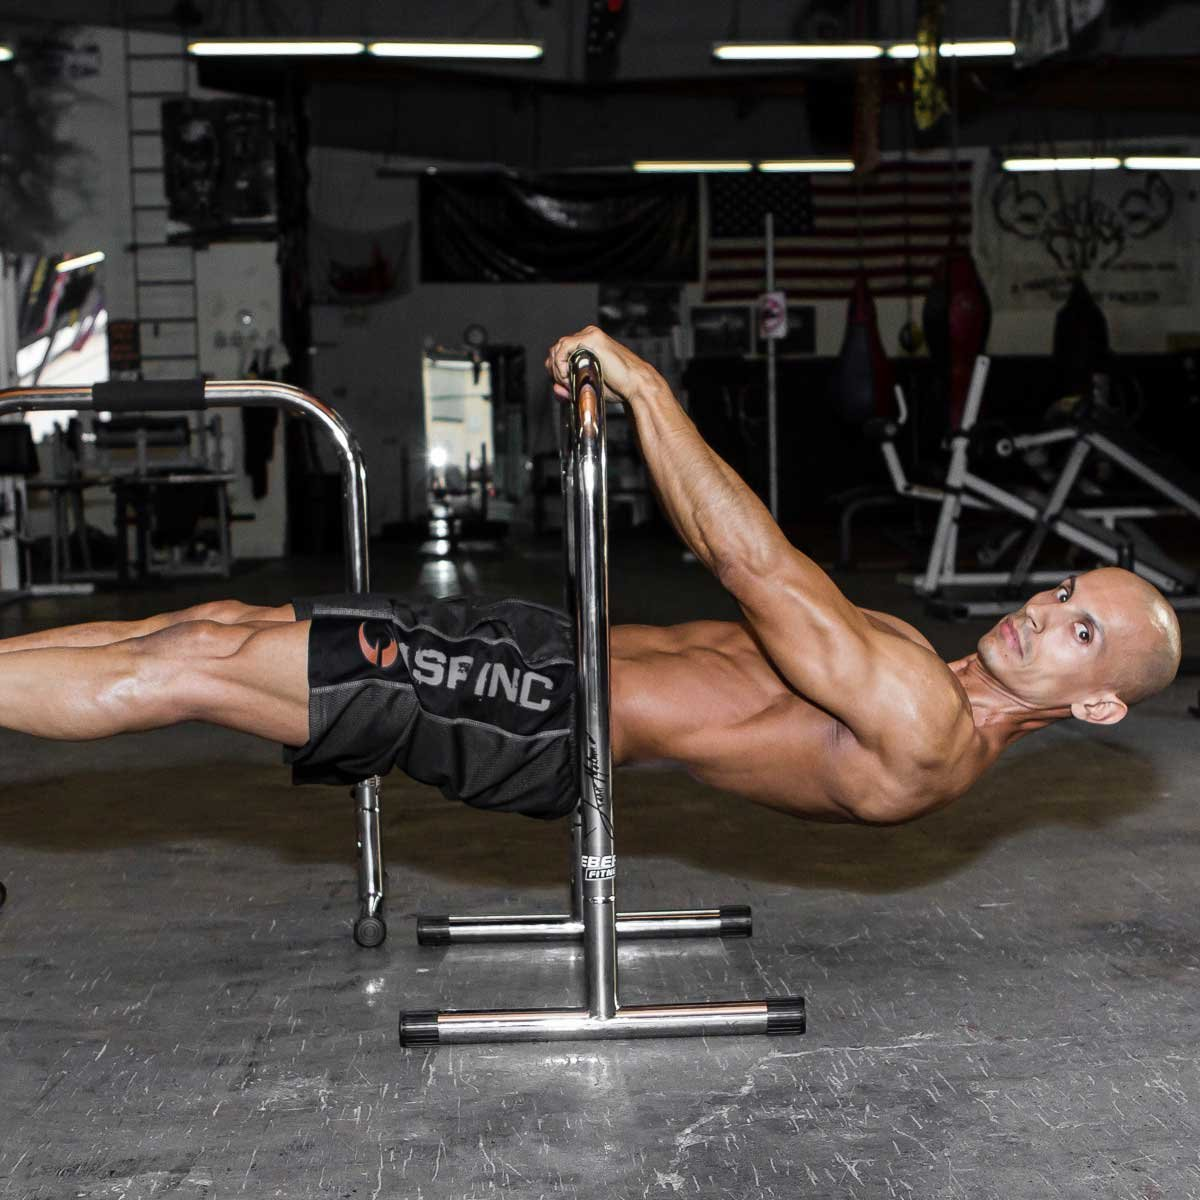 Lebert Fitness Equalizer Bars Total Body Strengthener, XL, Frank Medrano Signature, Chrome by Lebert (Image #5)